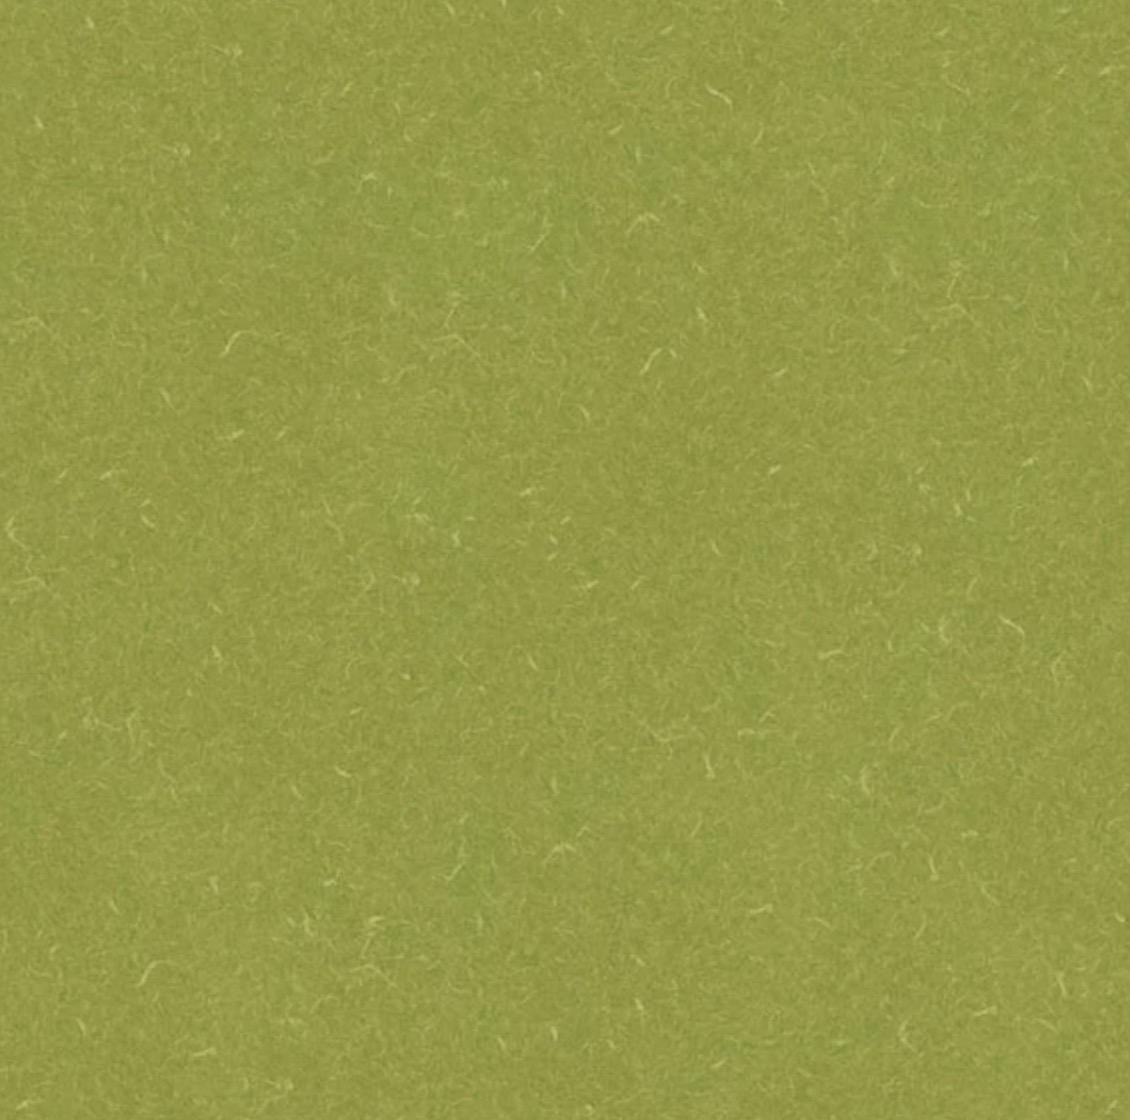 Vinyl-Grabo-Silver-Knight-Lotus-Kiwi